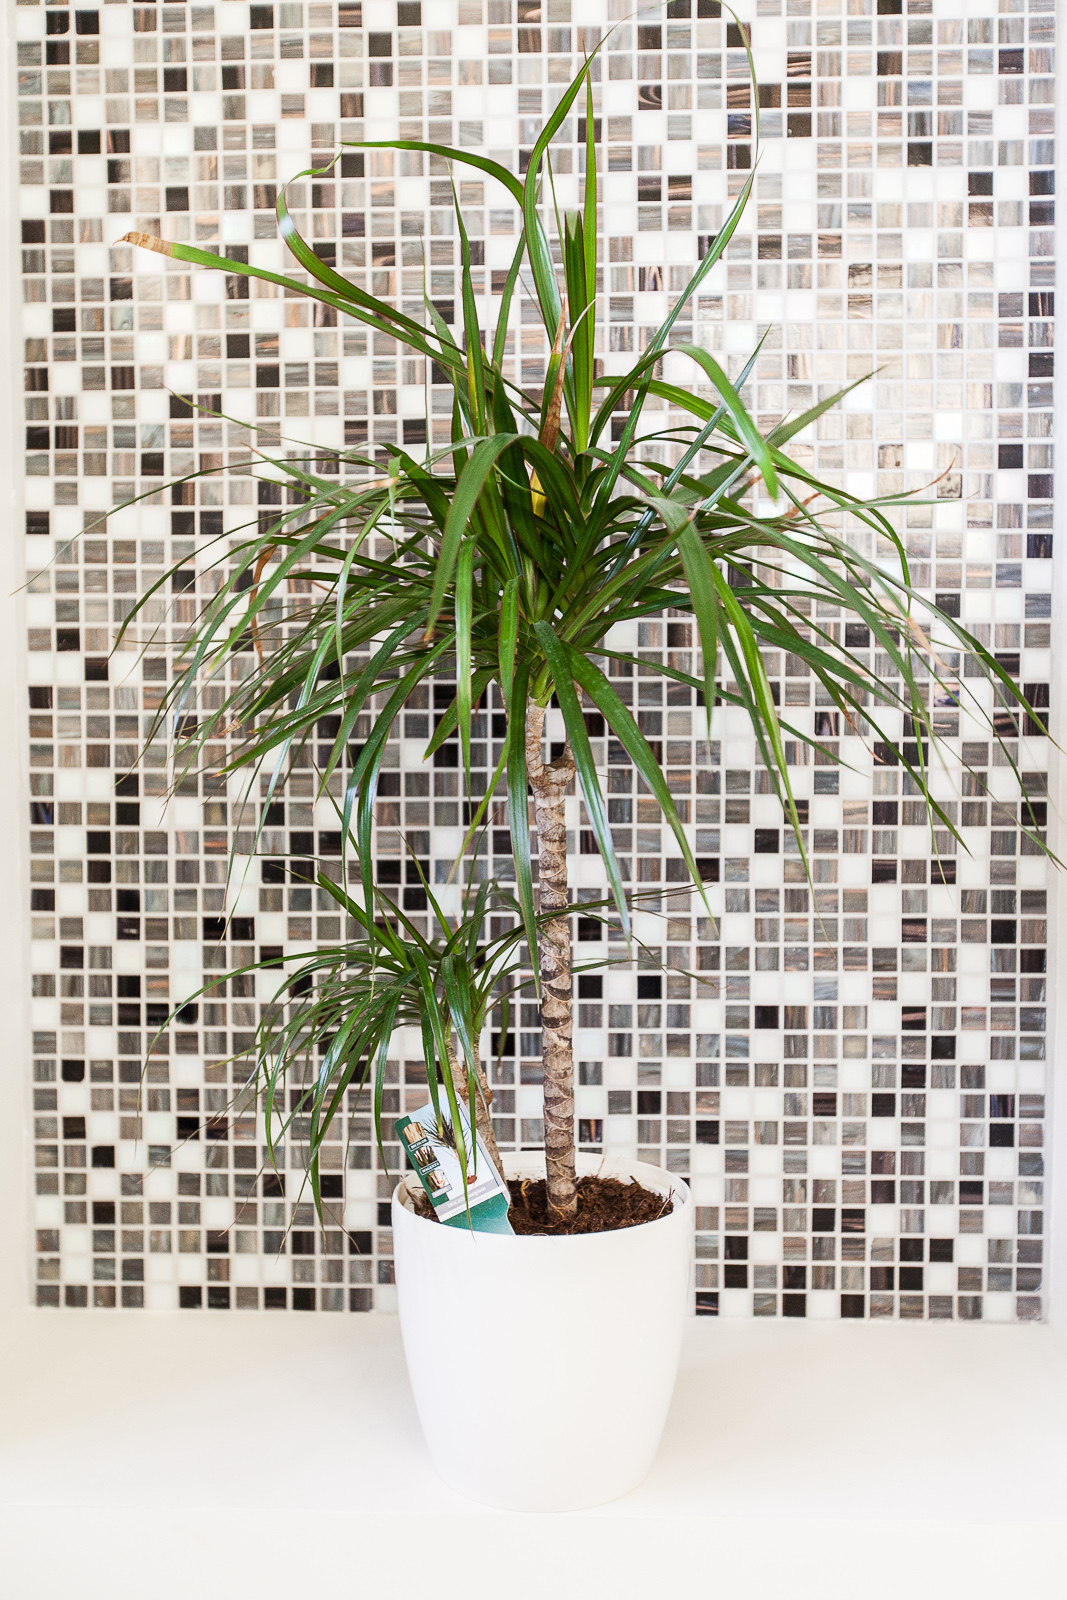 Hotel Marotte amiens chambre superieur plante